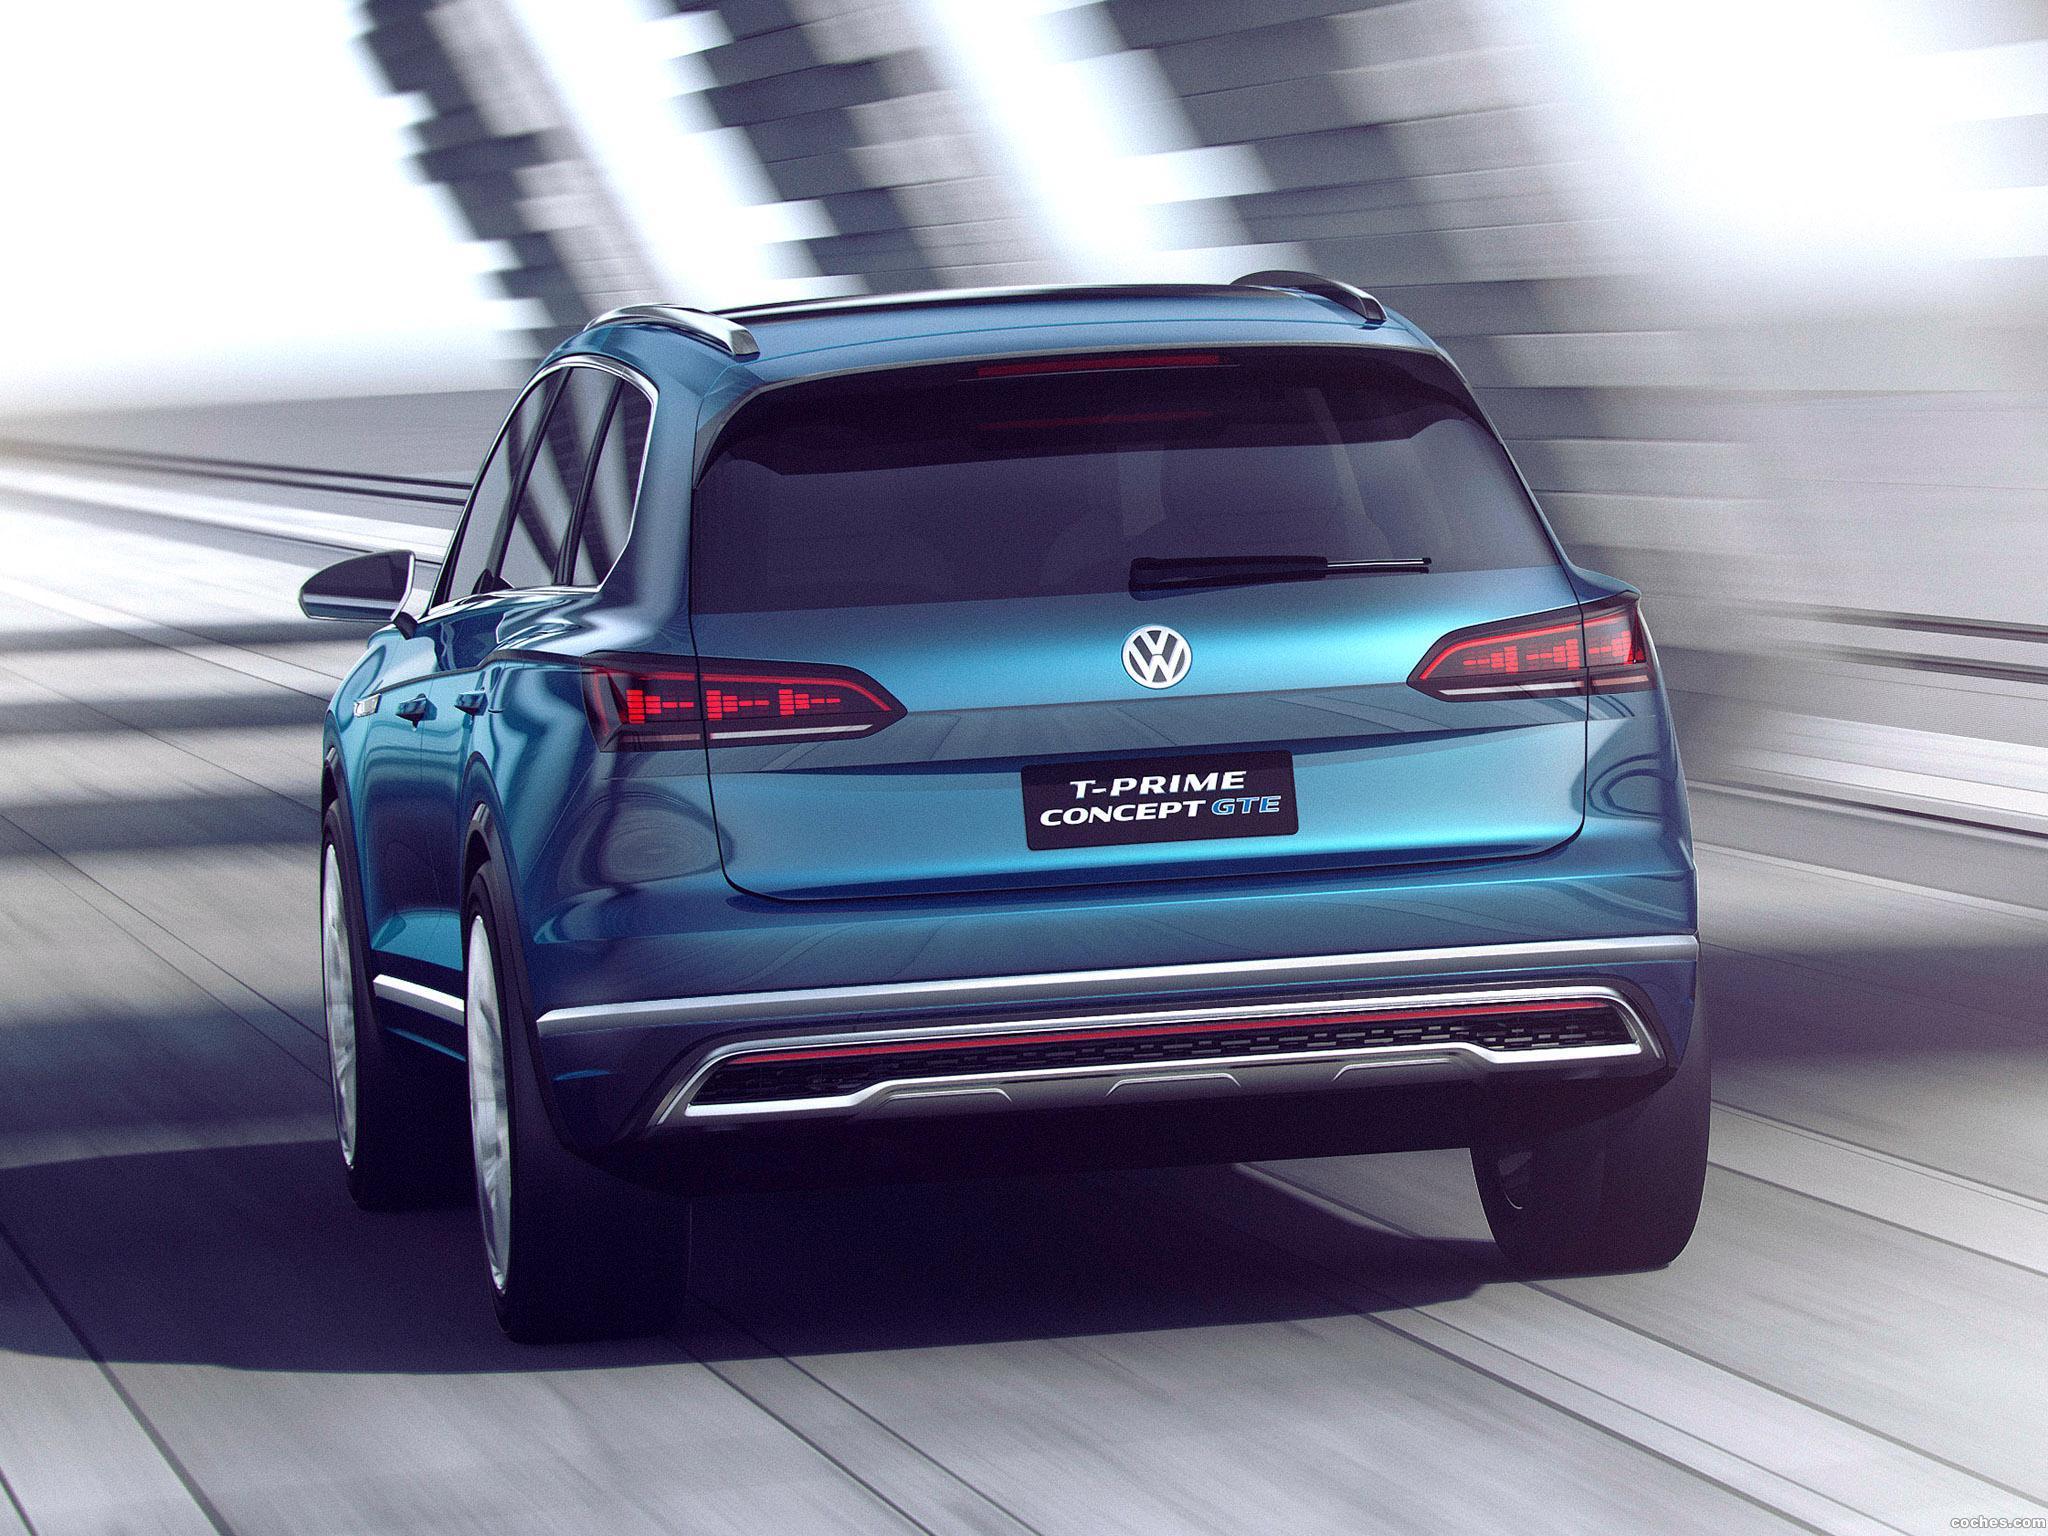 Foto 9 de Volkswagen T Prime GTE Concept 2016